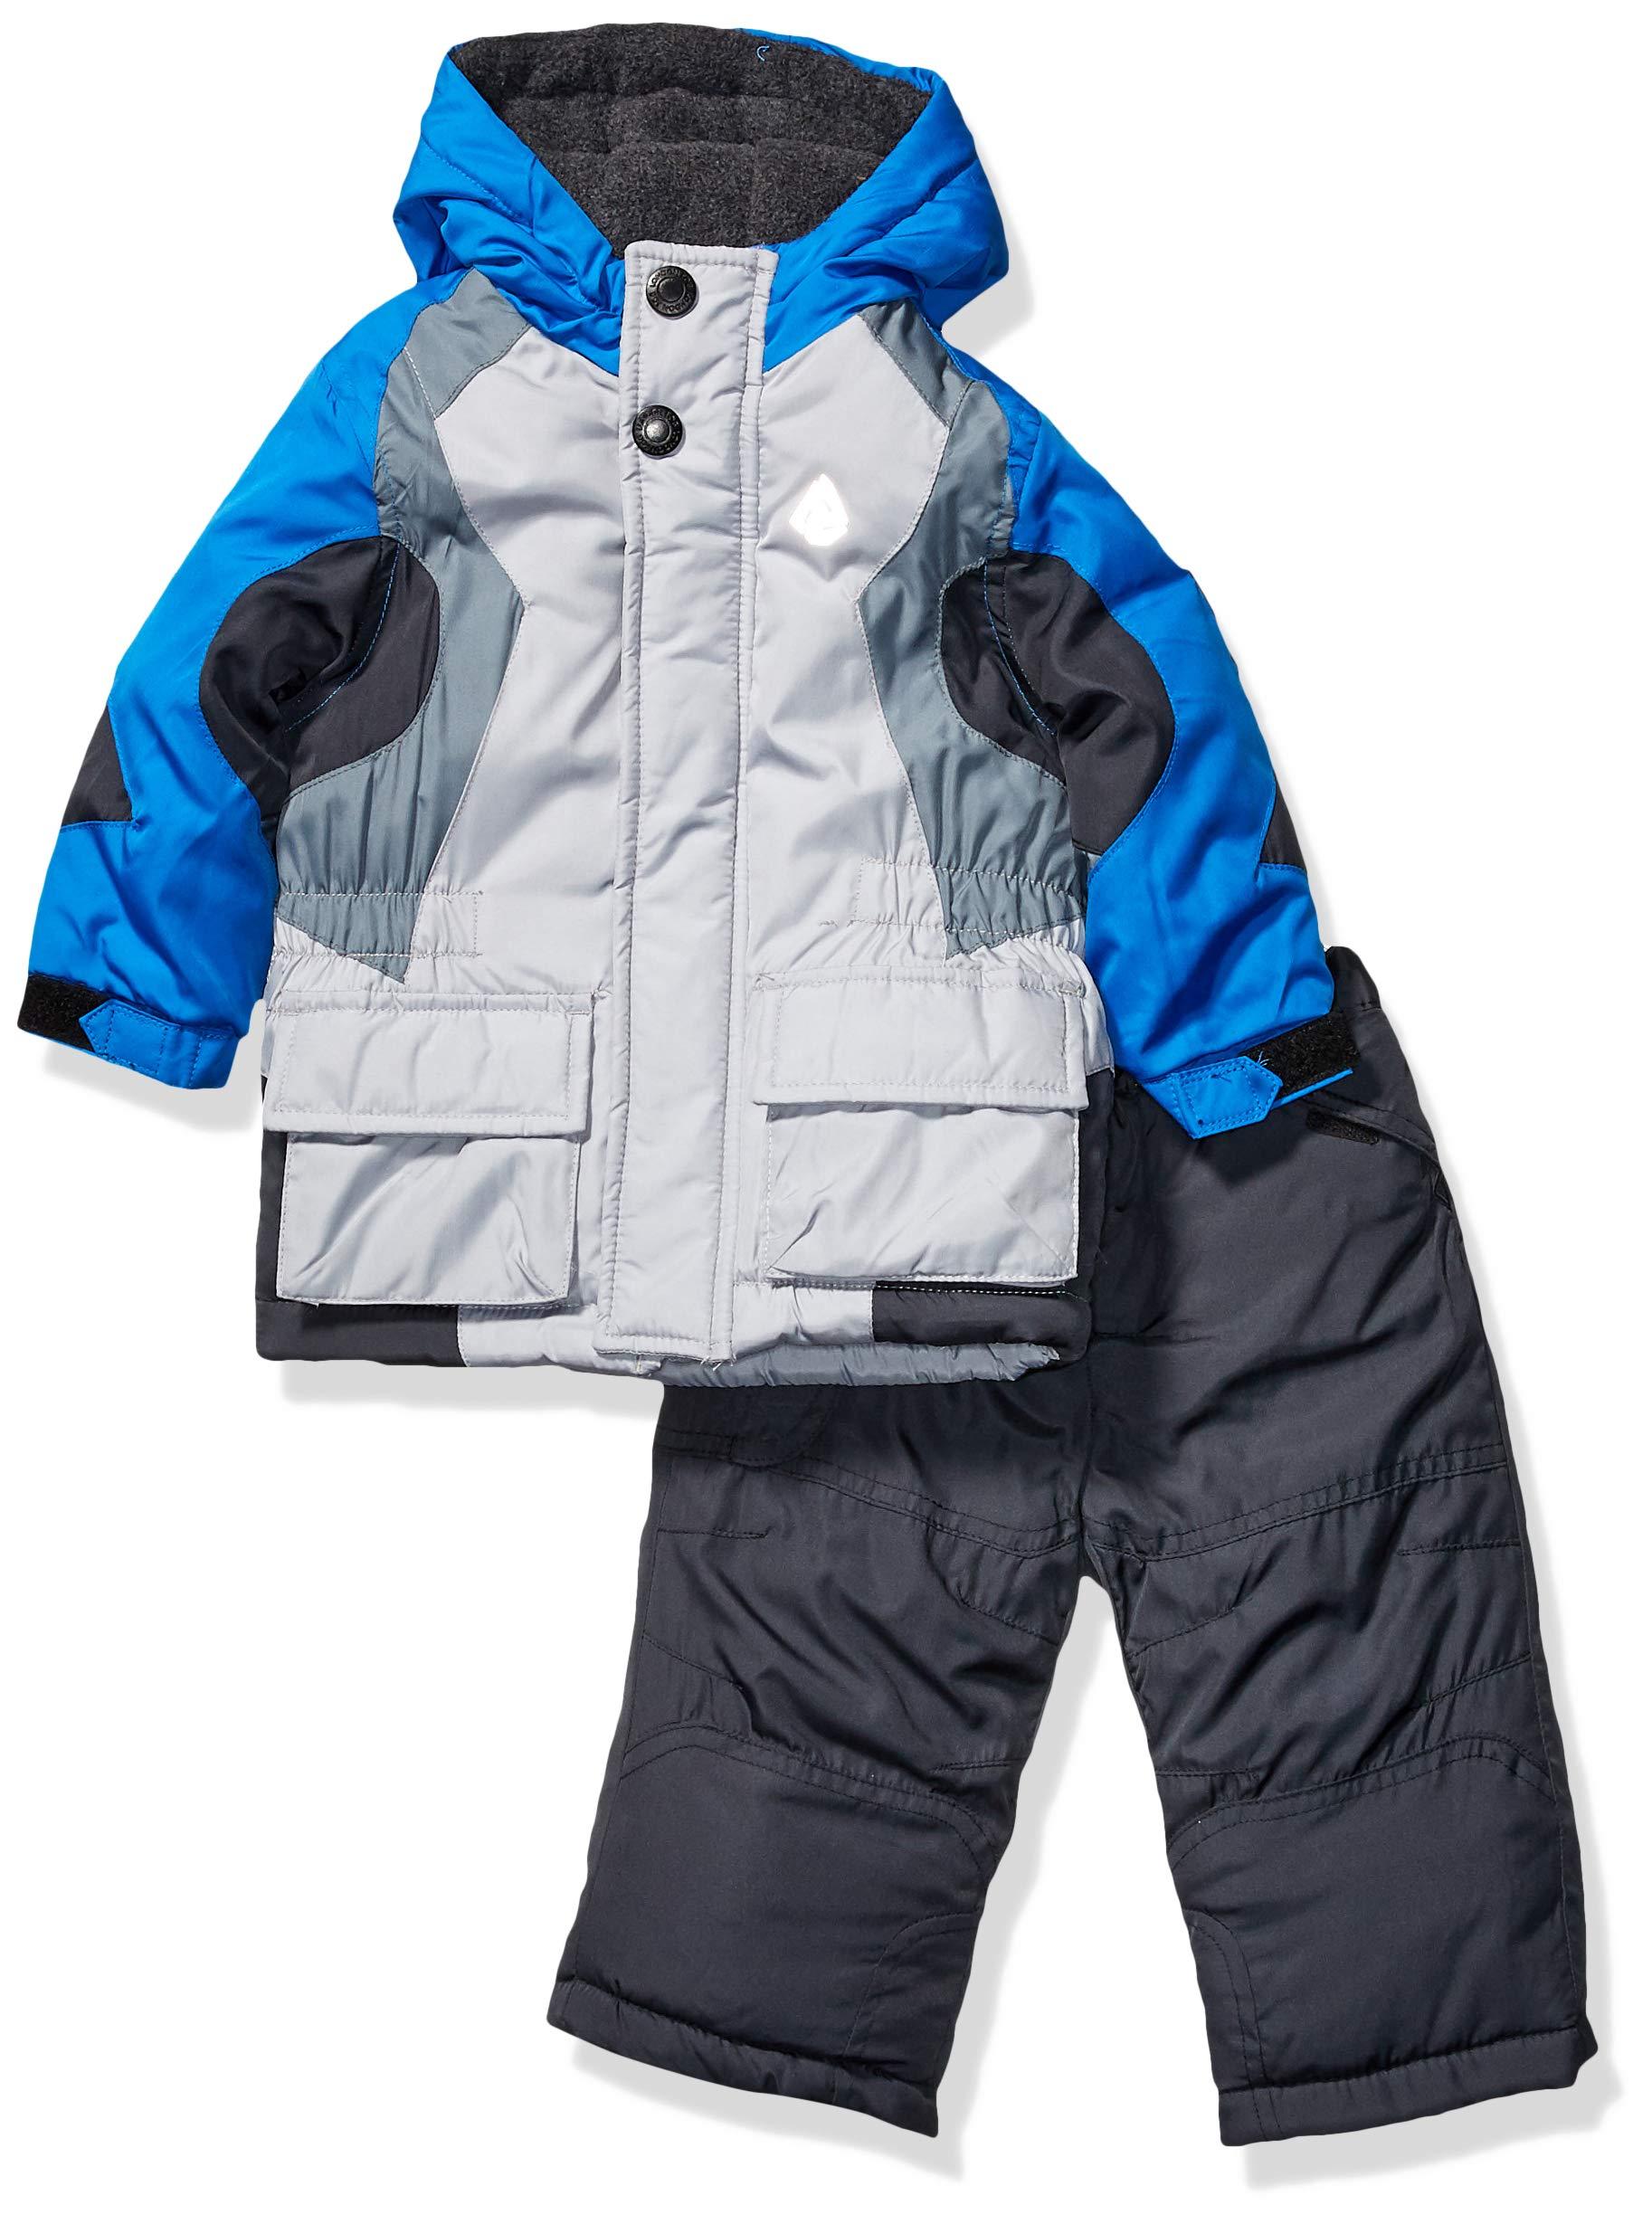 London Fog Baby Boys 2-Piece Snow Pant & Jacket Snowsuit, Blue and Pants, 18MO by London Fog